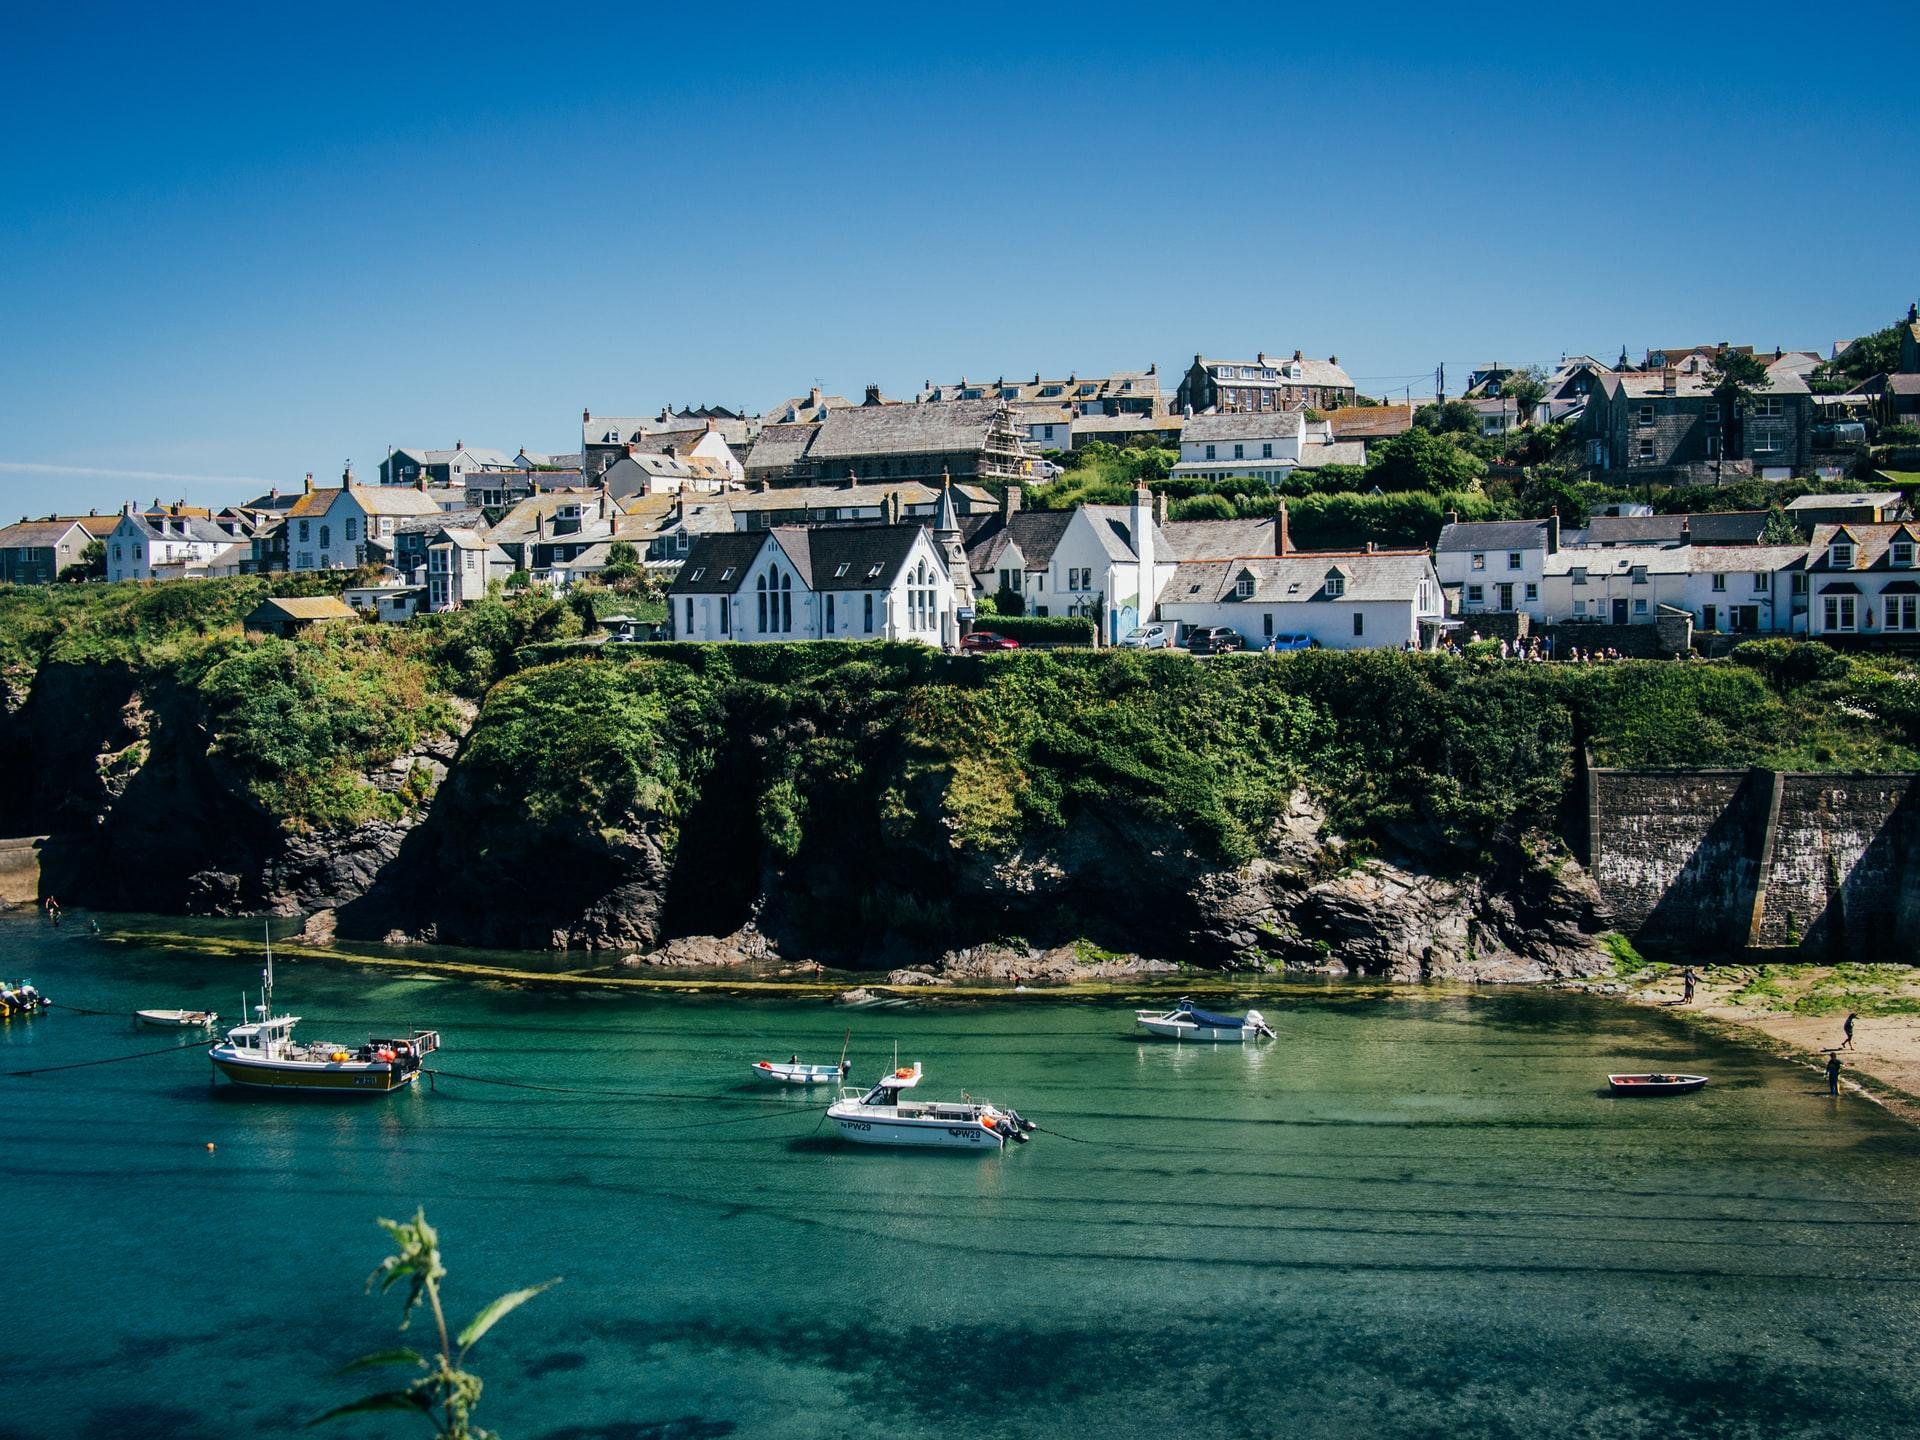 Summer holidays in Cornwall – Slummy single mummy